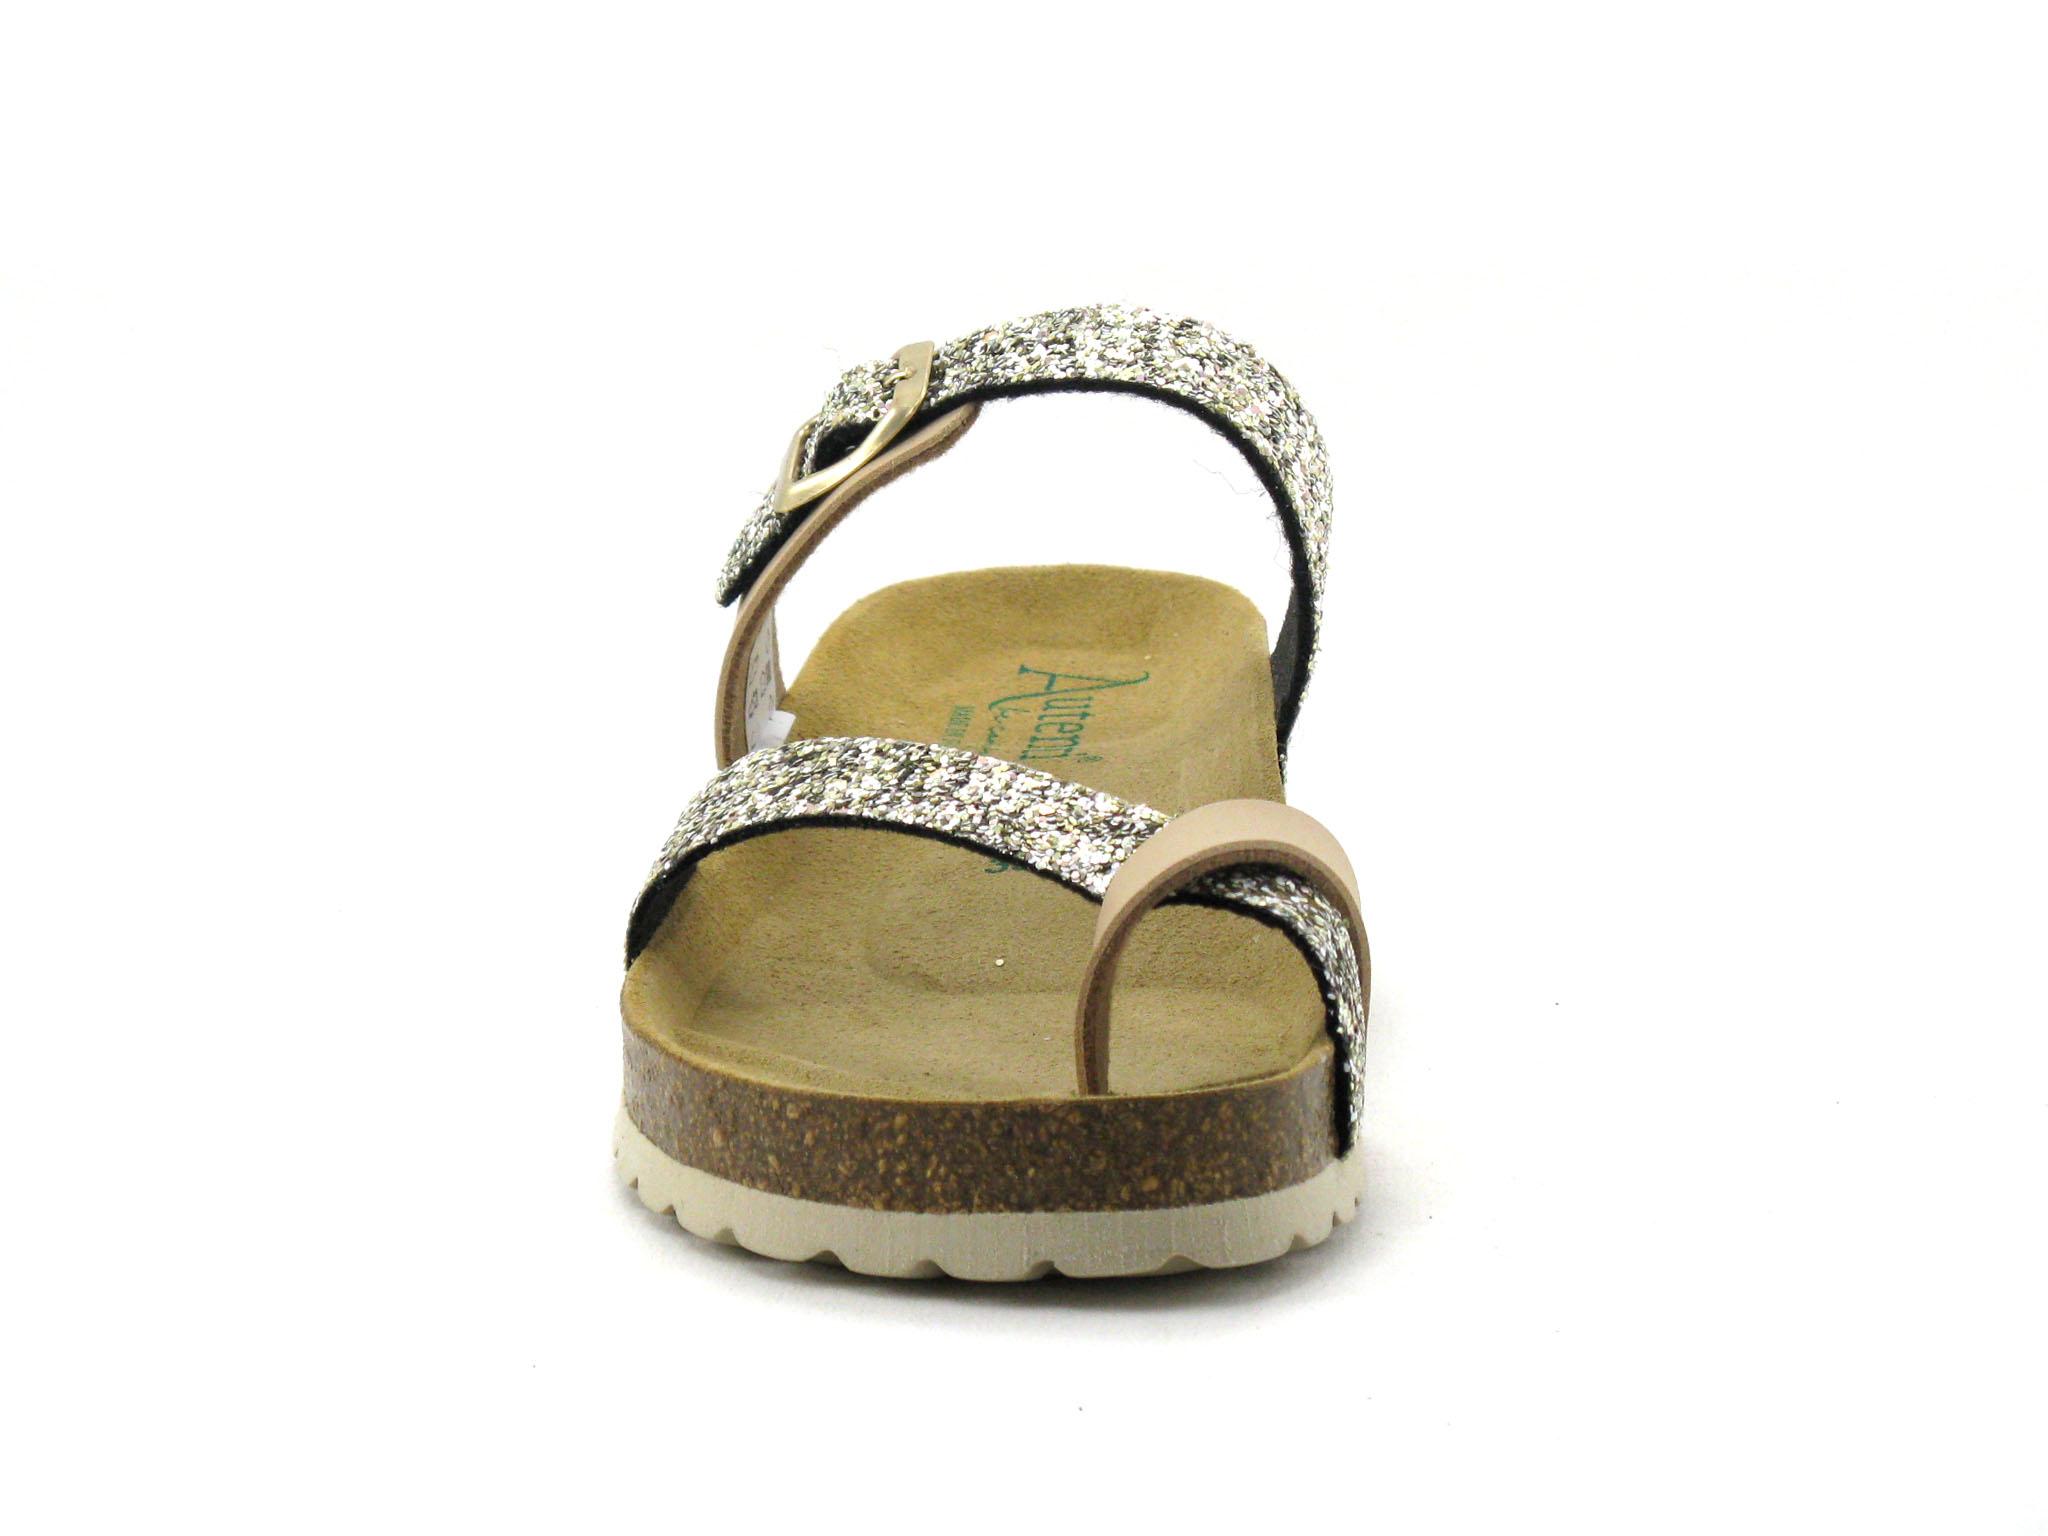 Achat chaussures Autenti by Penta Femme Entre-doigts